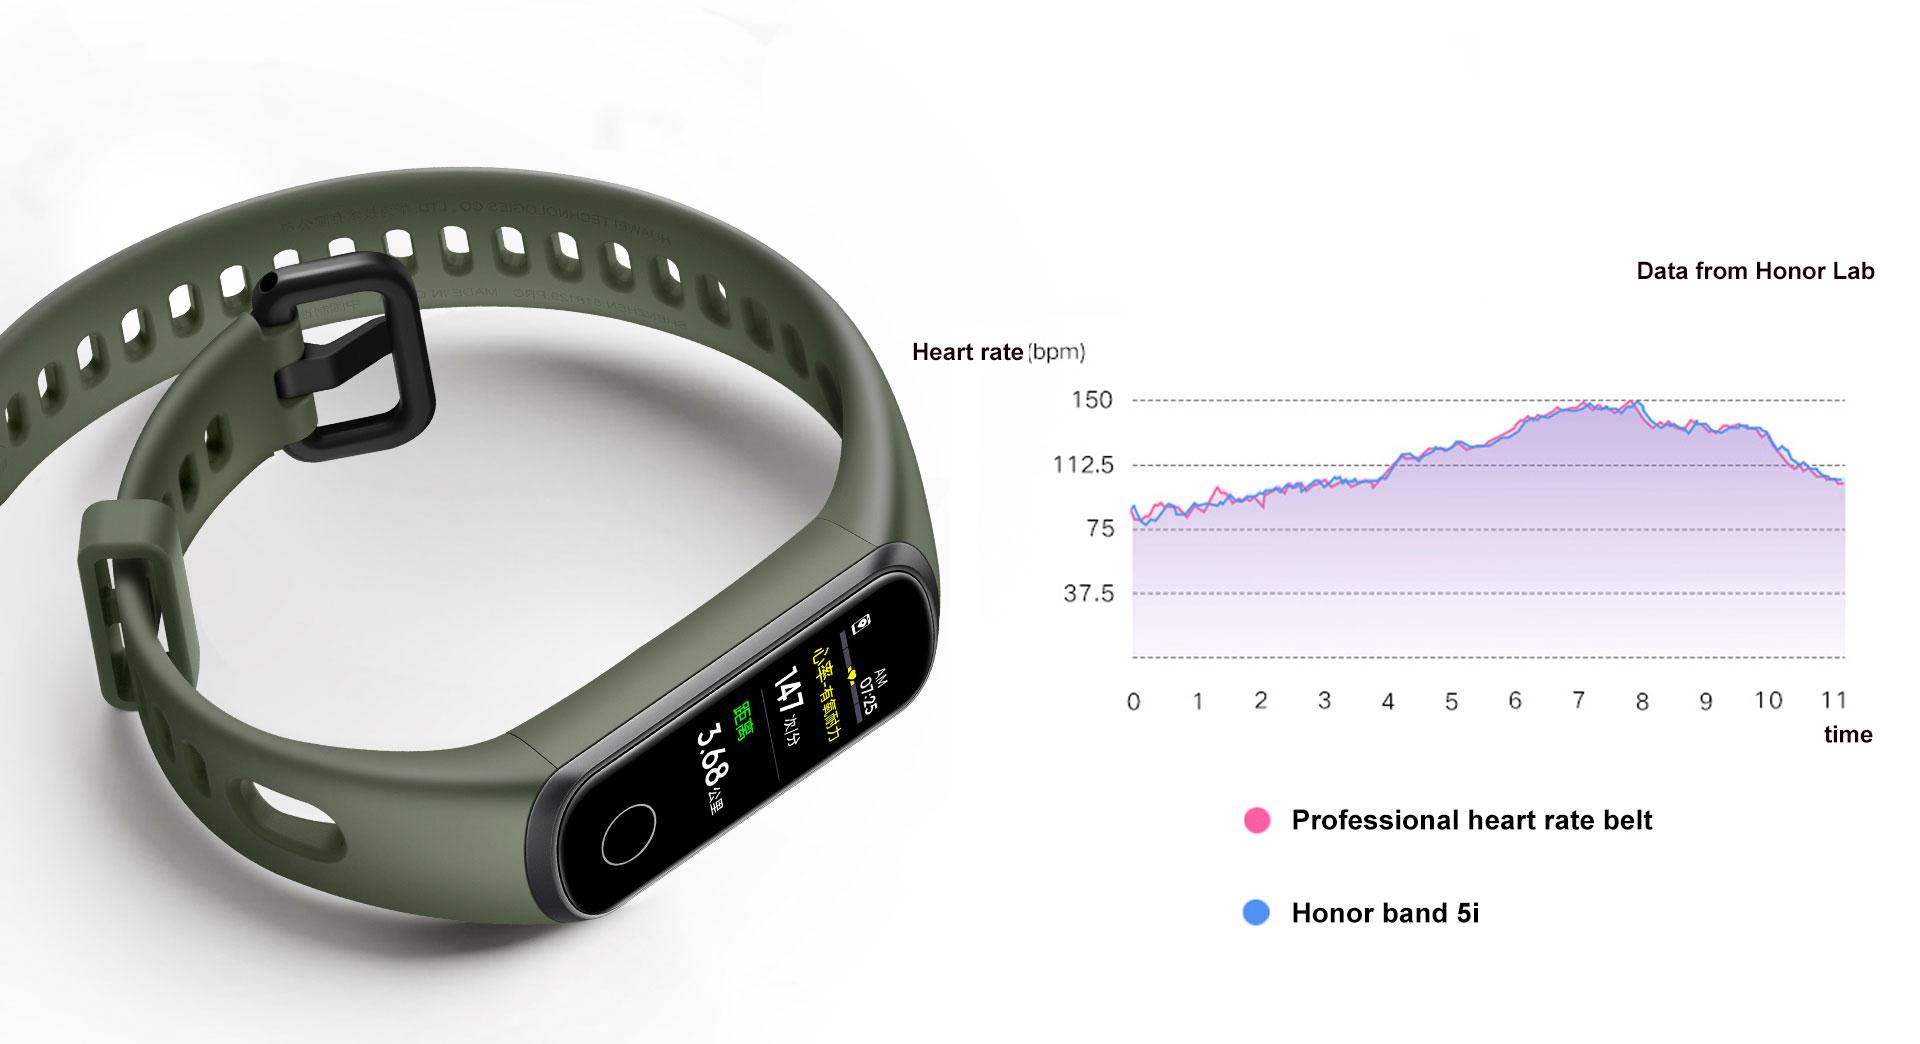 H8468f2df89854794a6726d1afcb2954fg Honor Band 5i Wristband Smart Bracelet USB Charging Music Control Blood Oxygen Monitoring Sports Fitness Bracelet Running Tracke